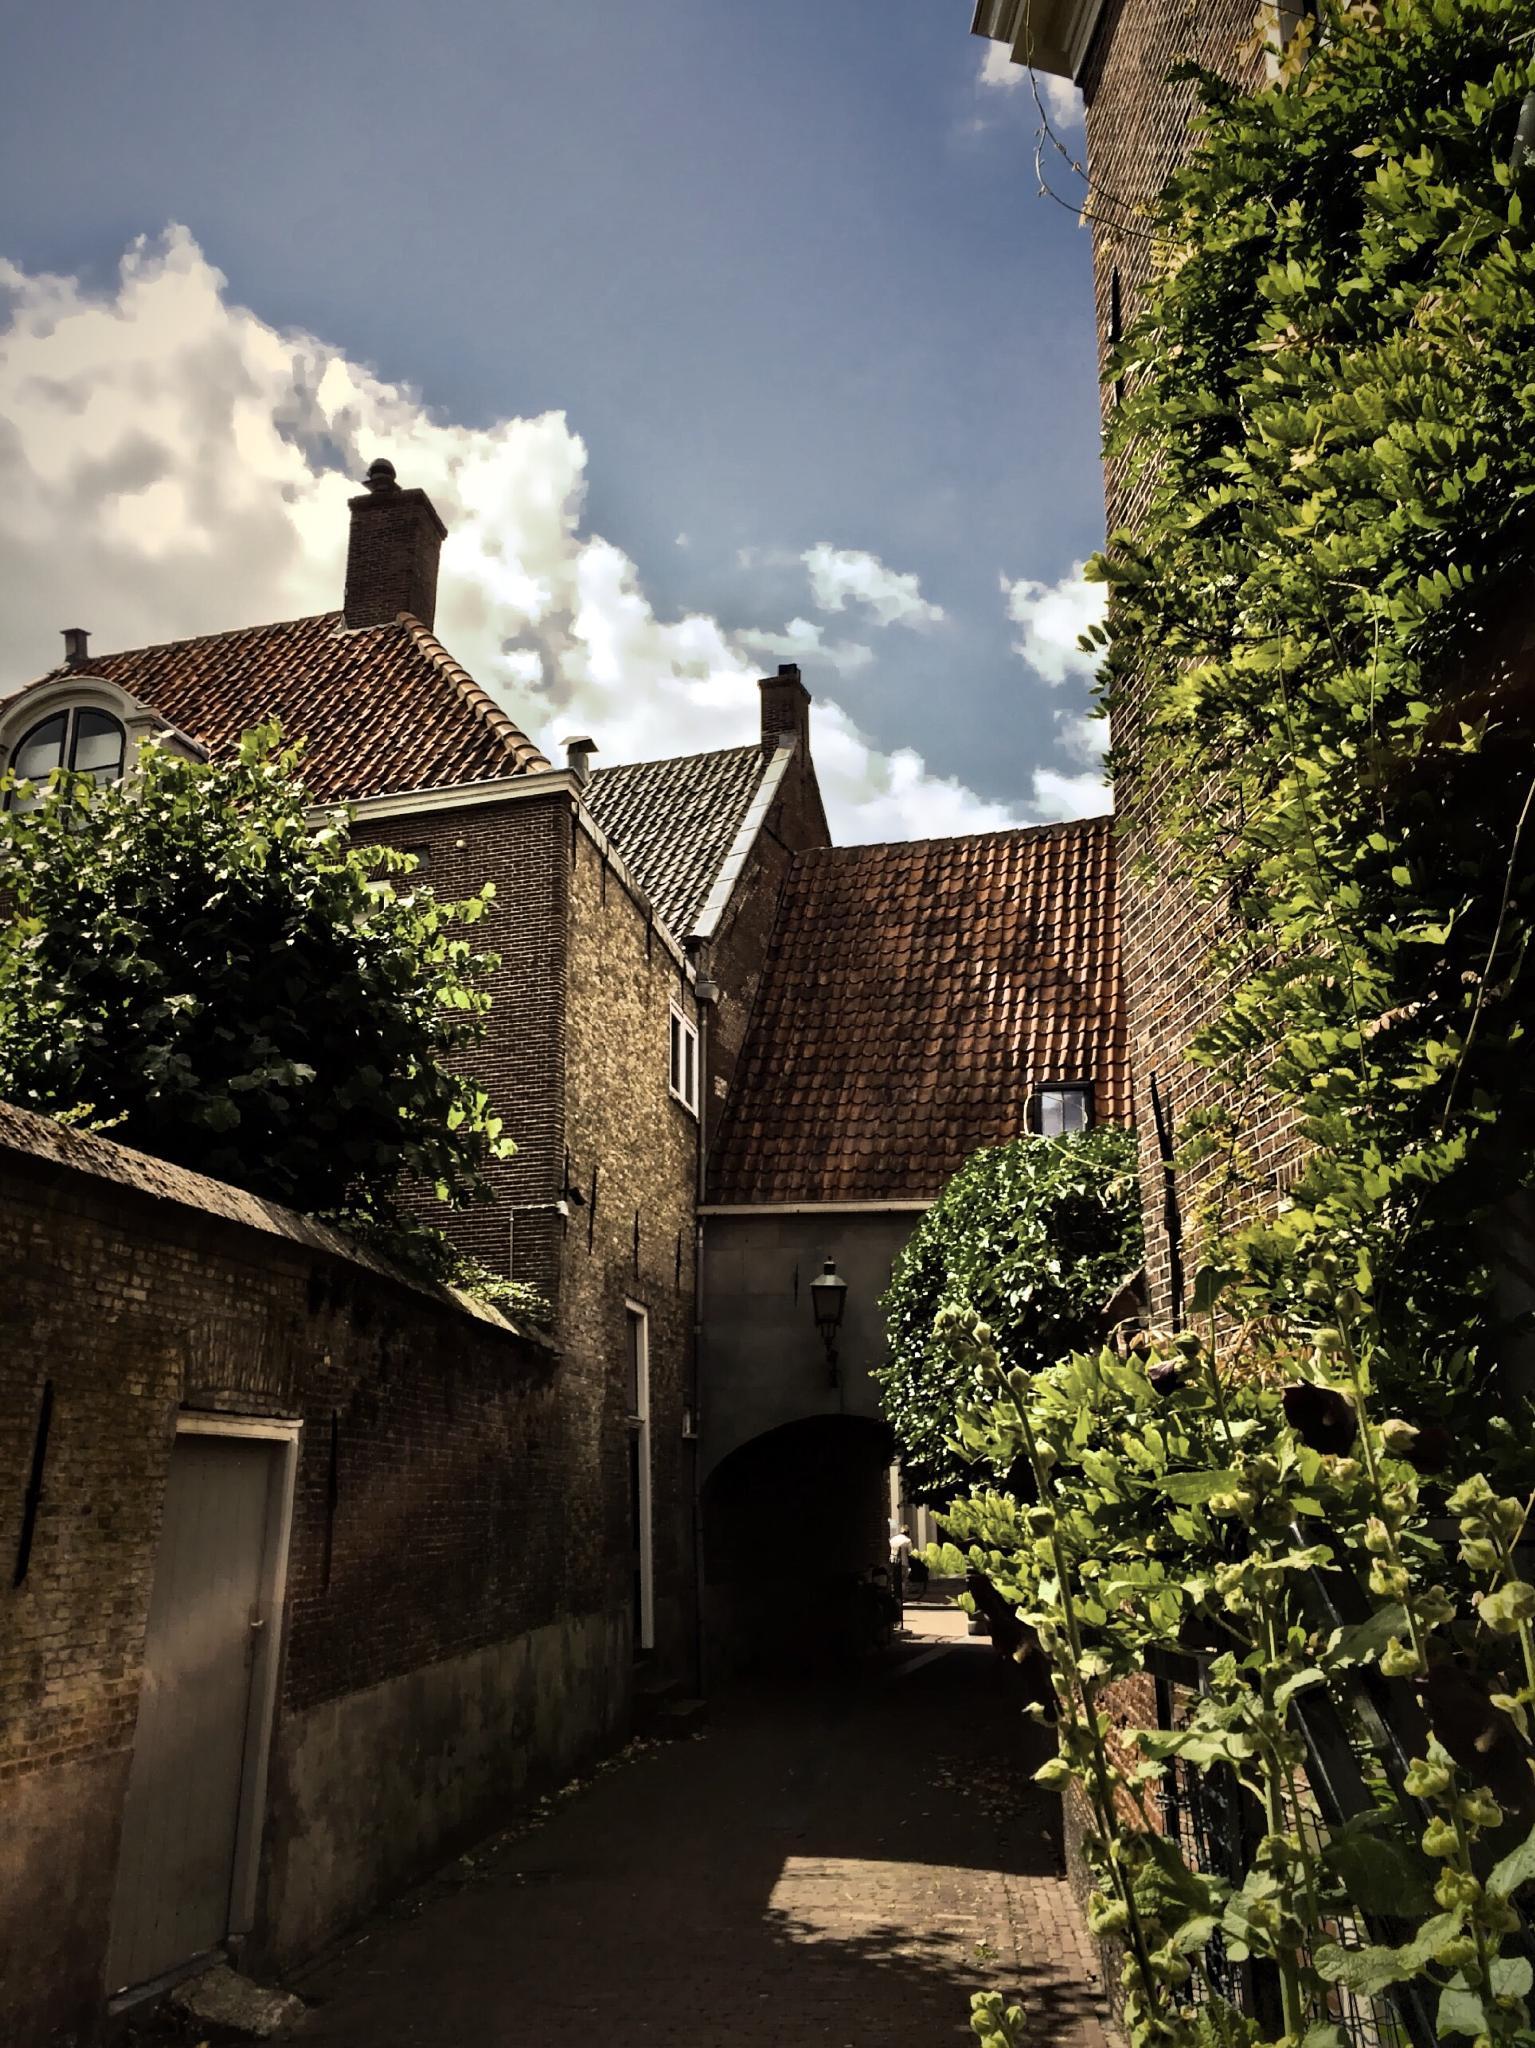 Hoorn, Netherlands, by Iphone/HDR by patrick vischschraper